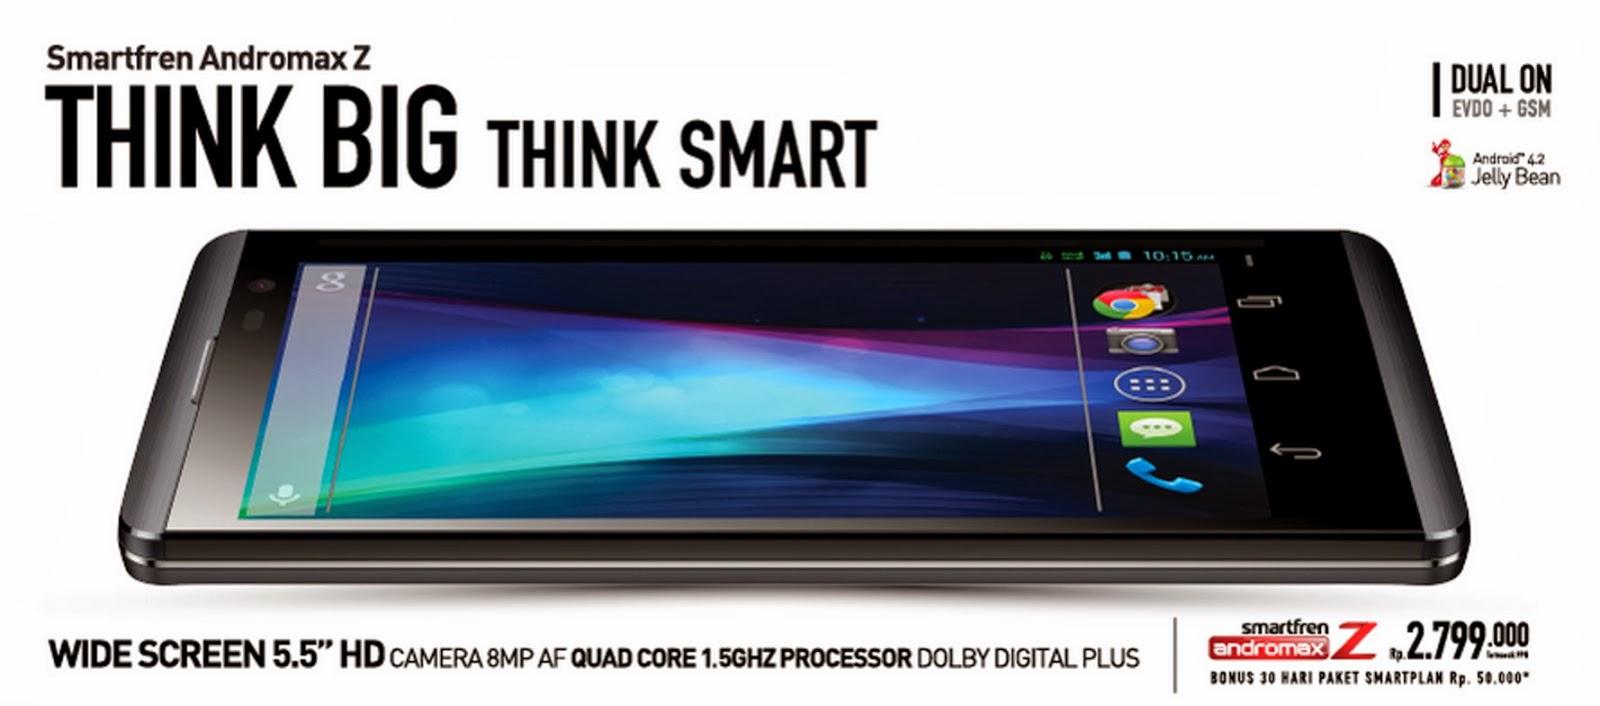 Smartfren Andromax Z Quad Core 8 MP | Harga Spesifikasi